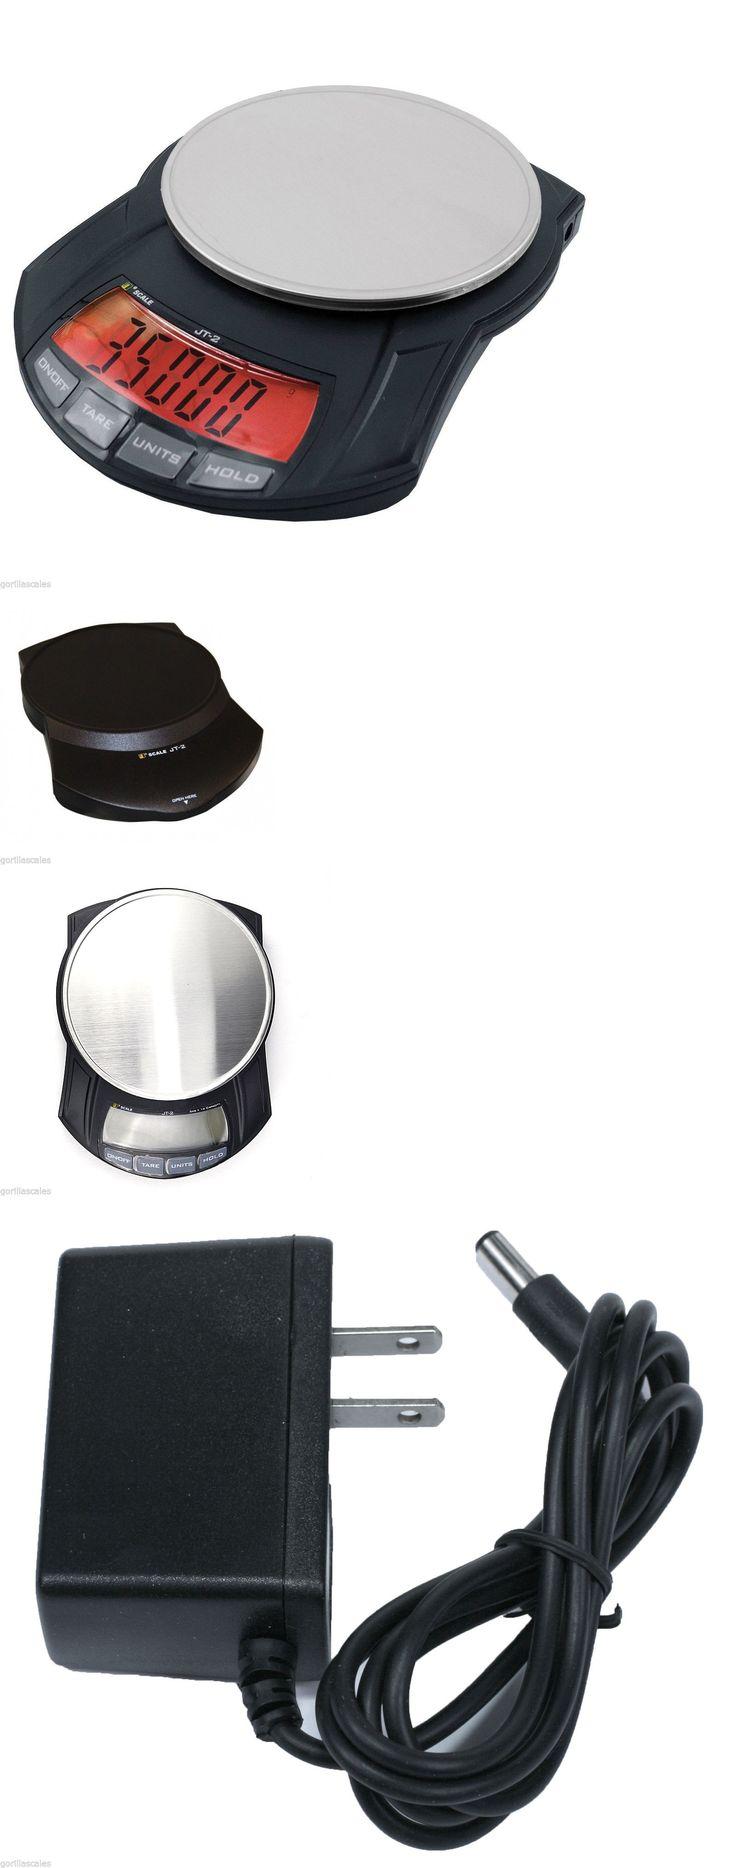 Pocket Digital Scales: Digital Scale 5000G X 1 Gram Jennings Jscale Jt-2 5000 Top Loader Ac Adapter BUY IT NOW ONLY: $39.95